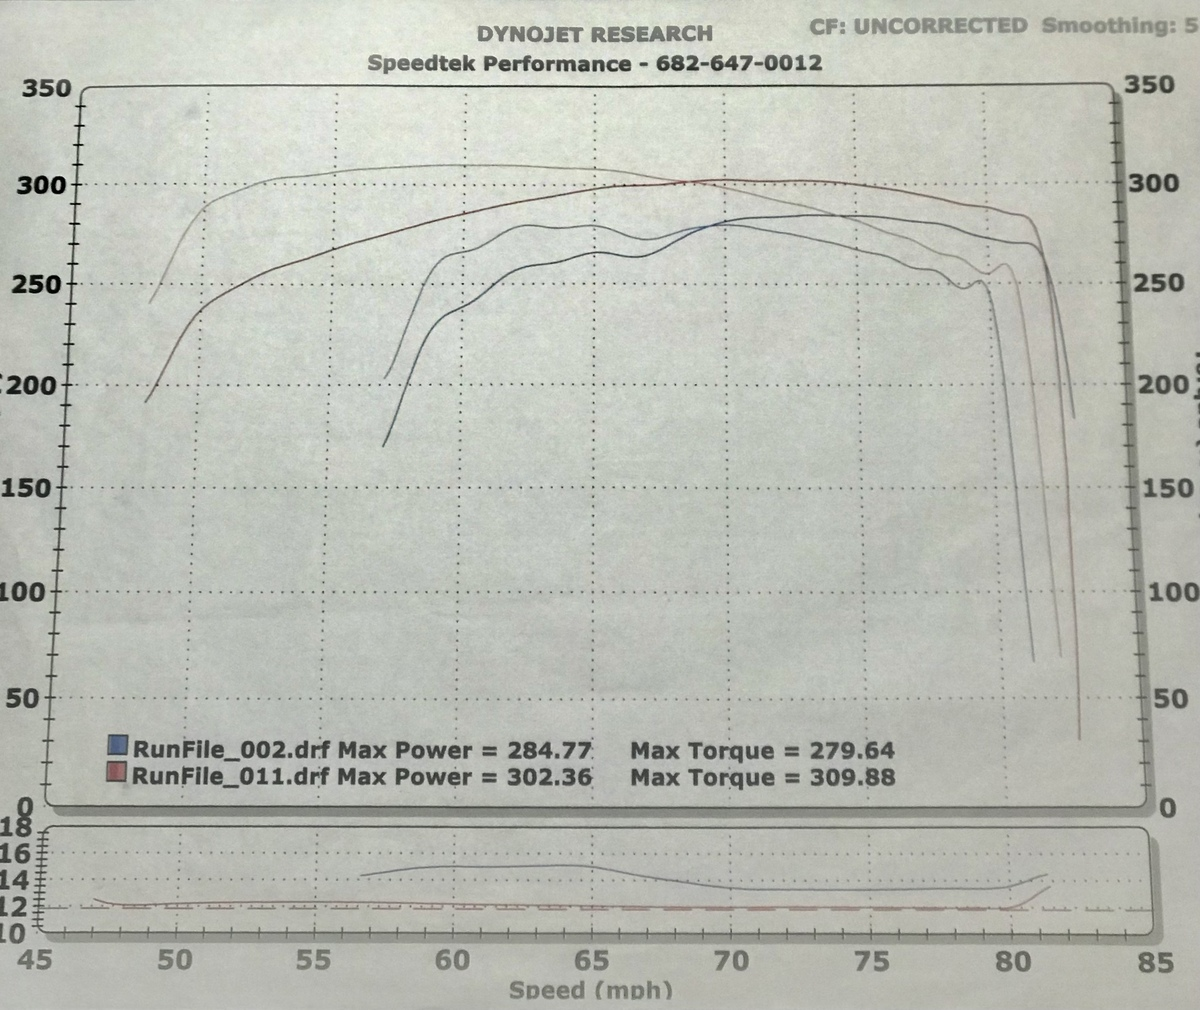 Dodge Ram 1500 Dyno Graph Results